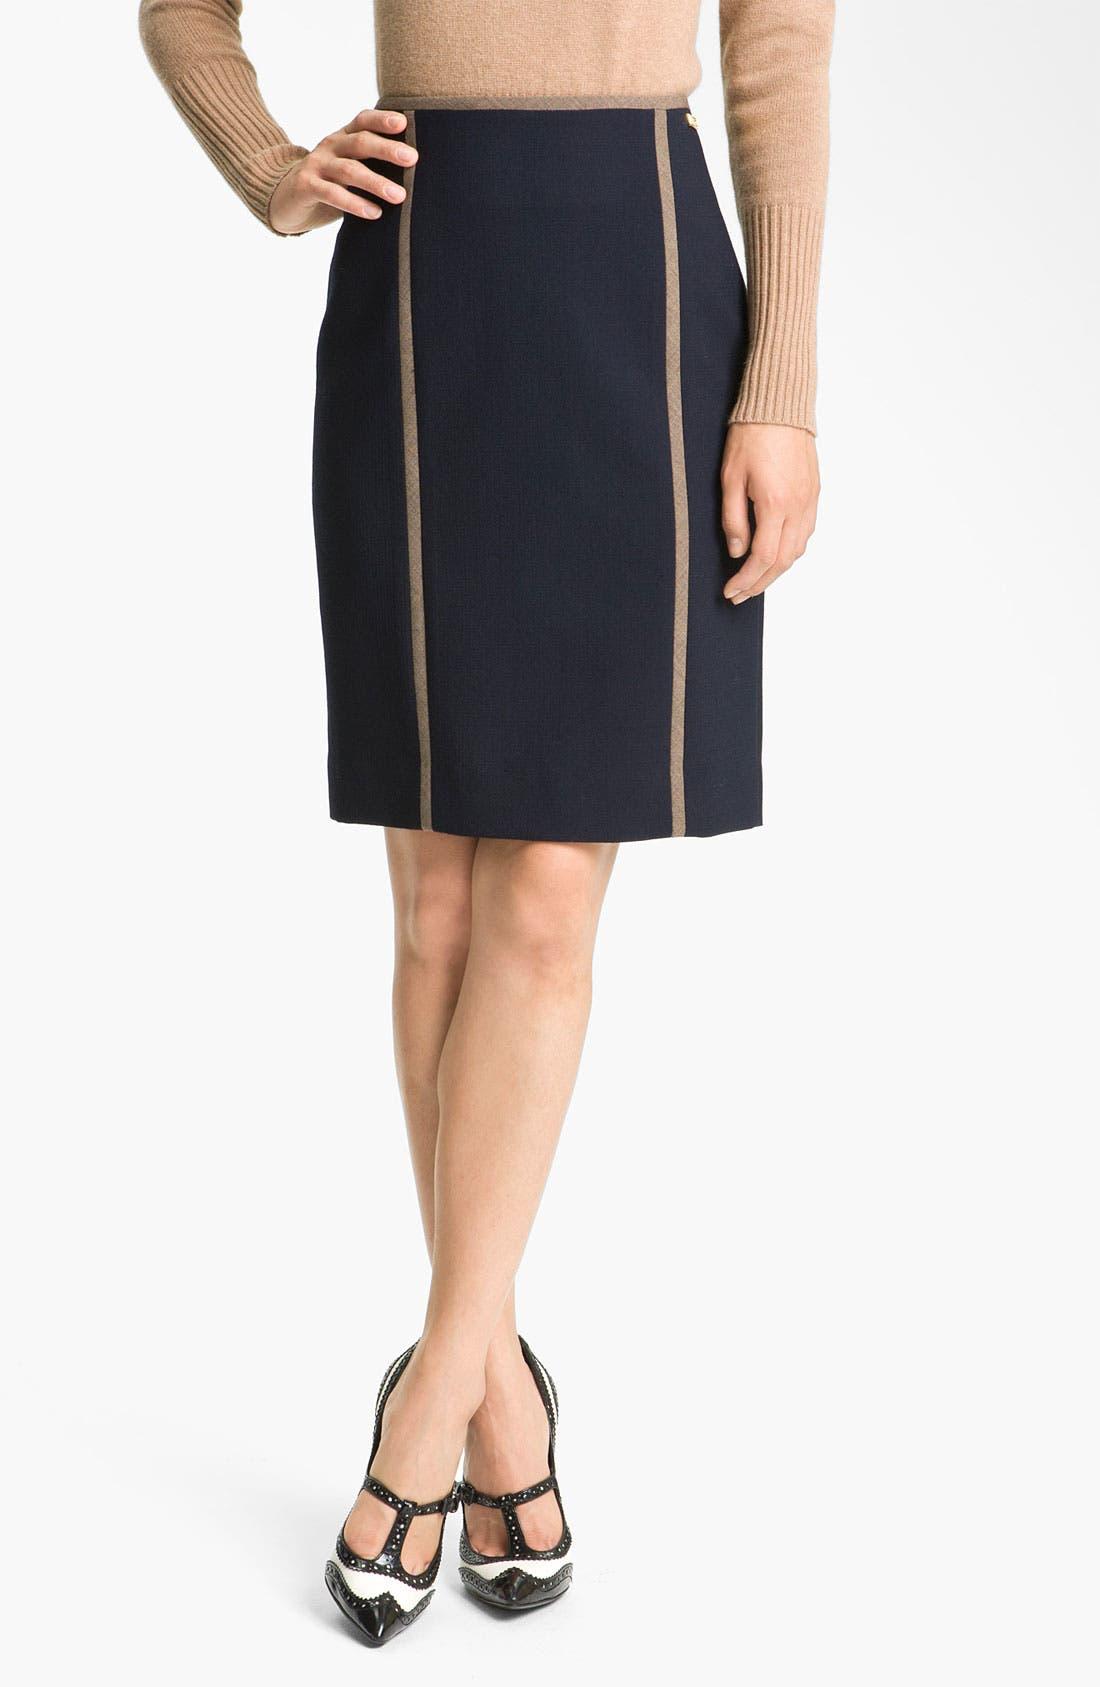 Main Image - Tory Burch 'Azalea' Skirt